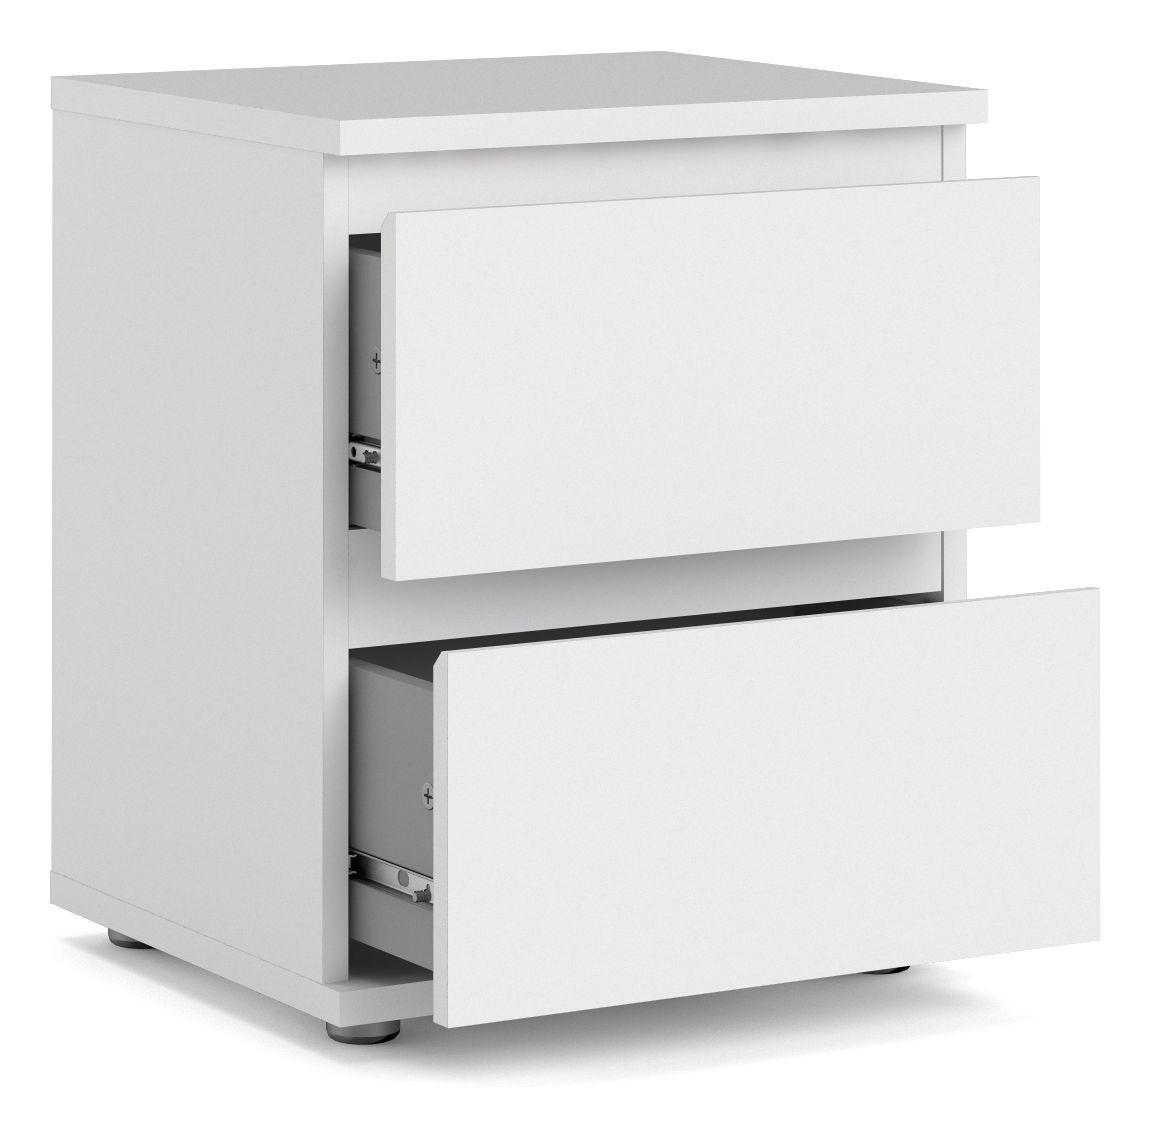 Nova Sengebord - Hvid - Hvidt sengebord m. 2 skuffer